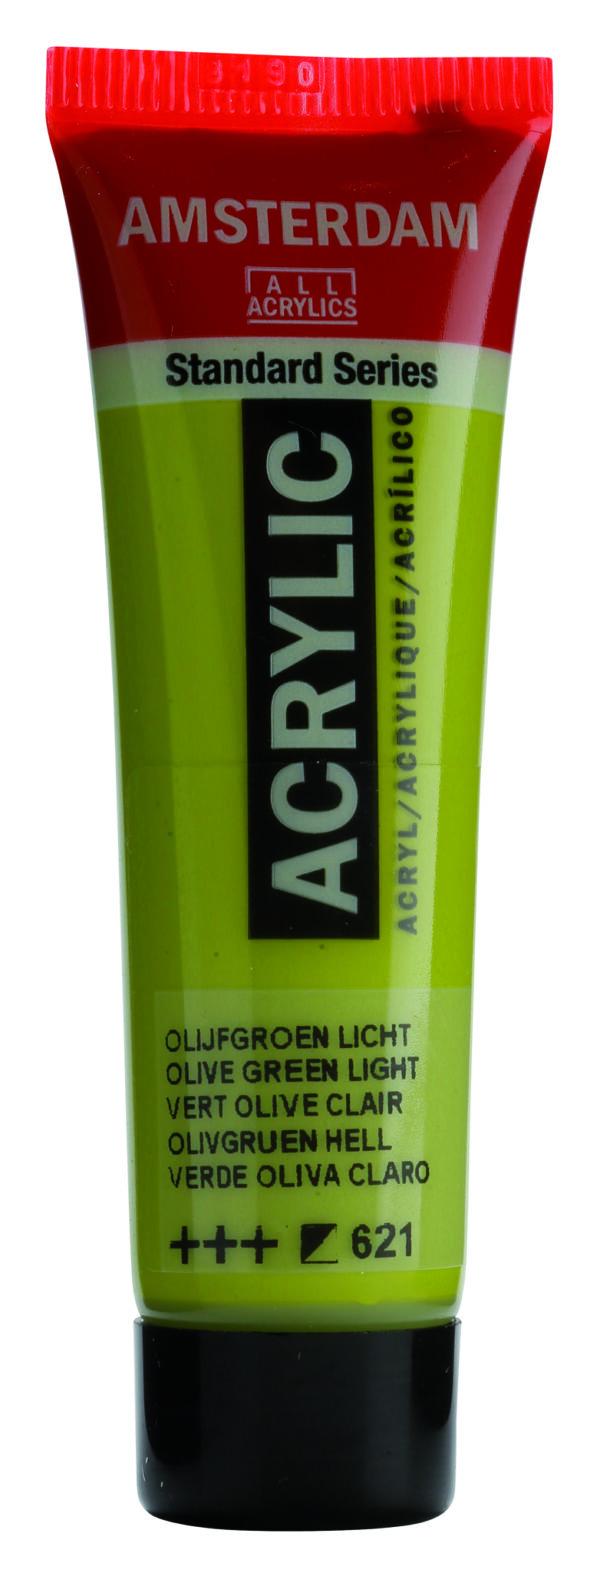 Ams std 621 Olive green Light - 20 ml